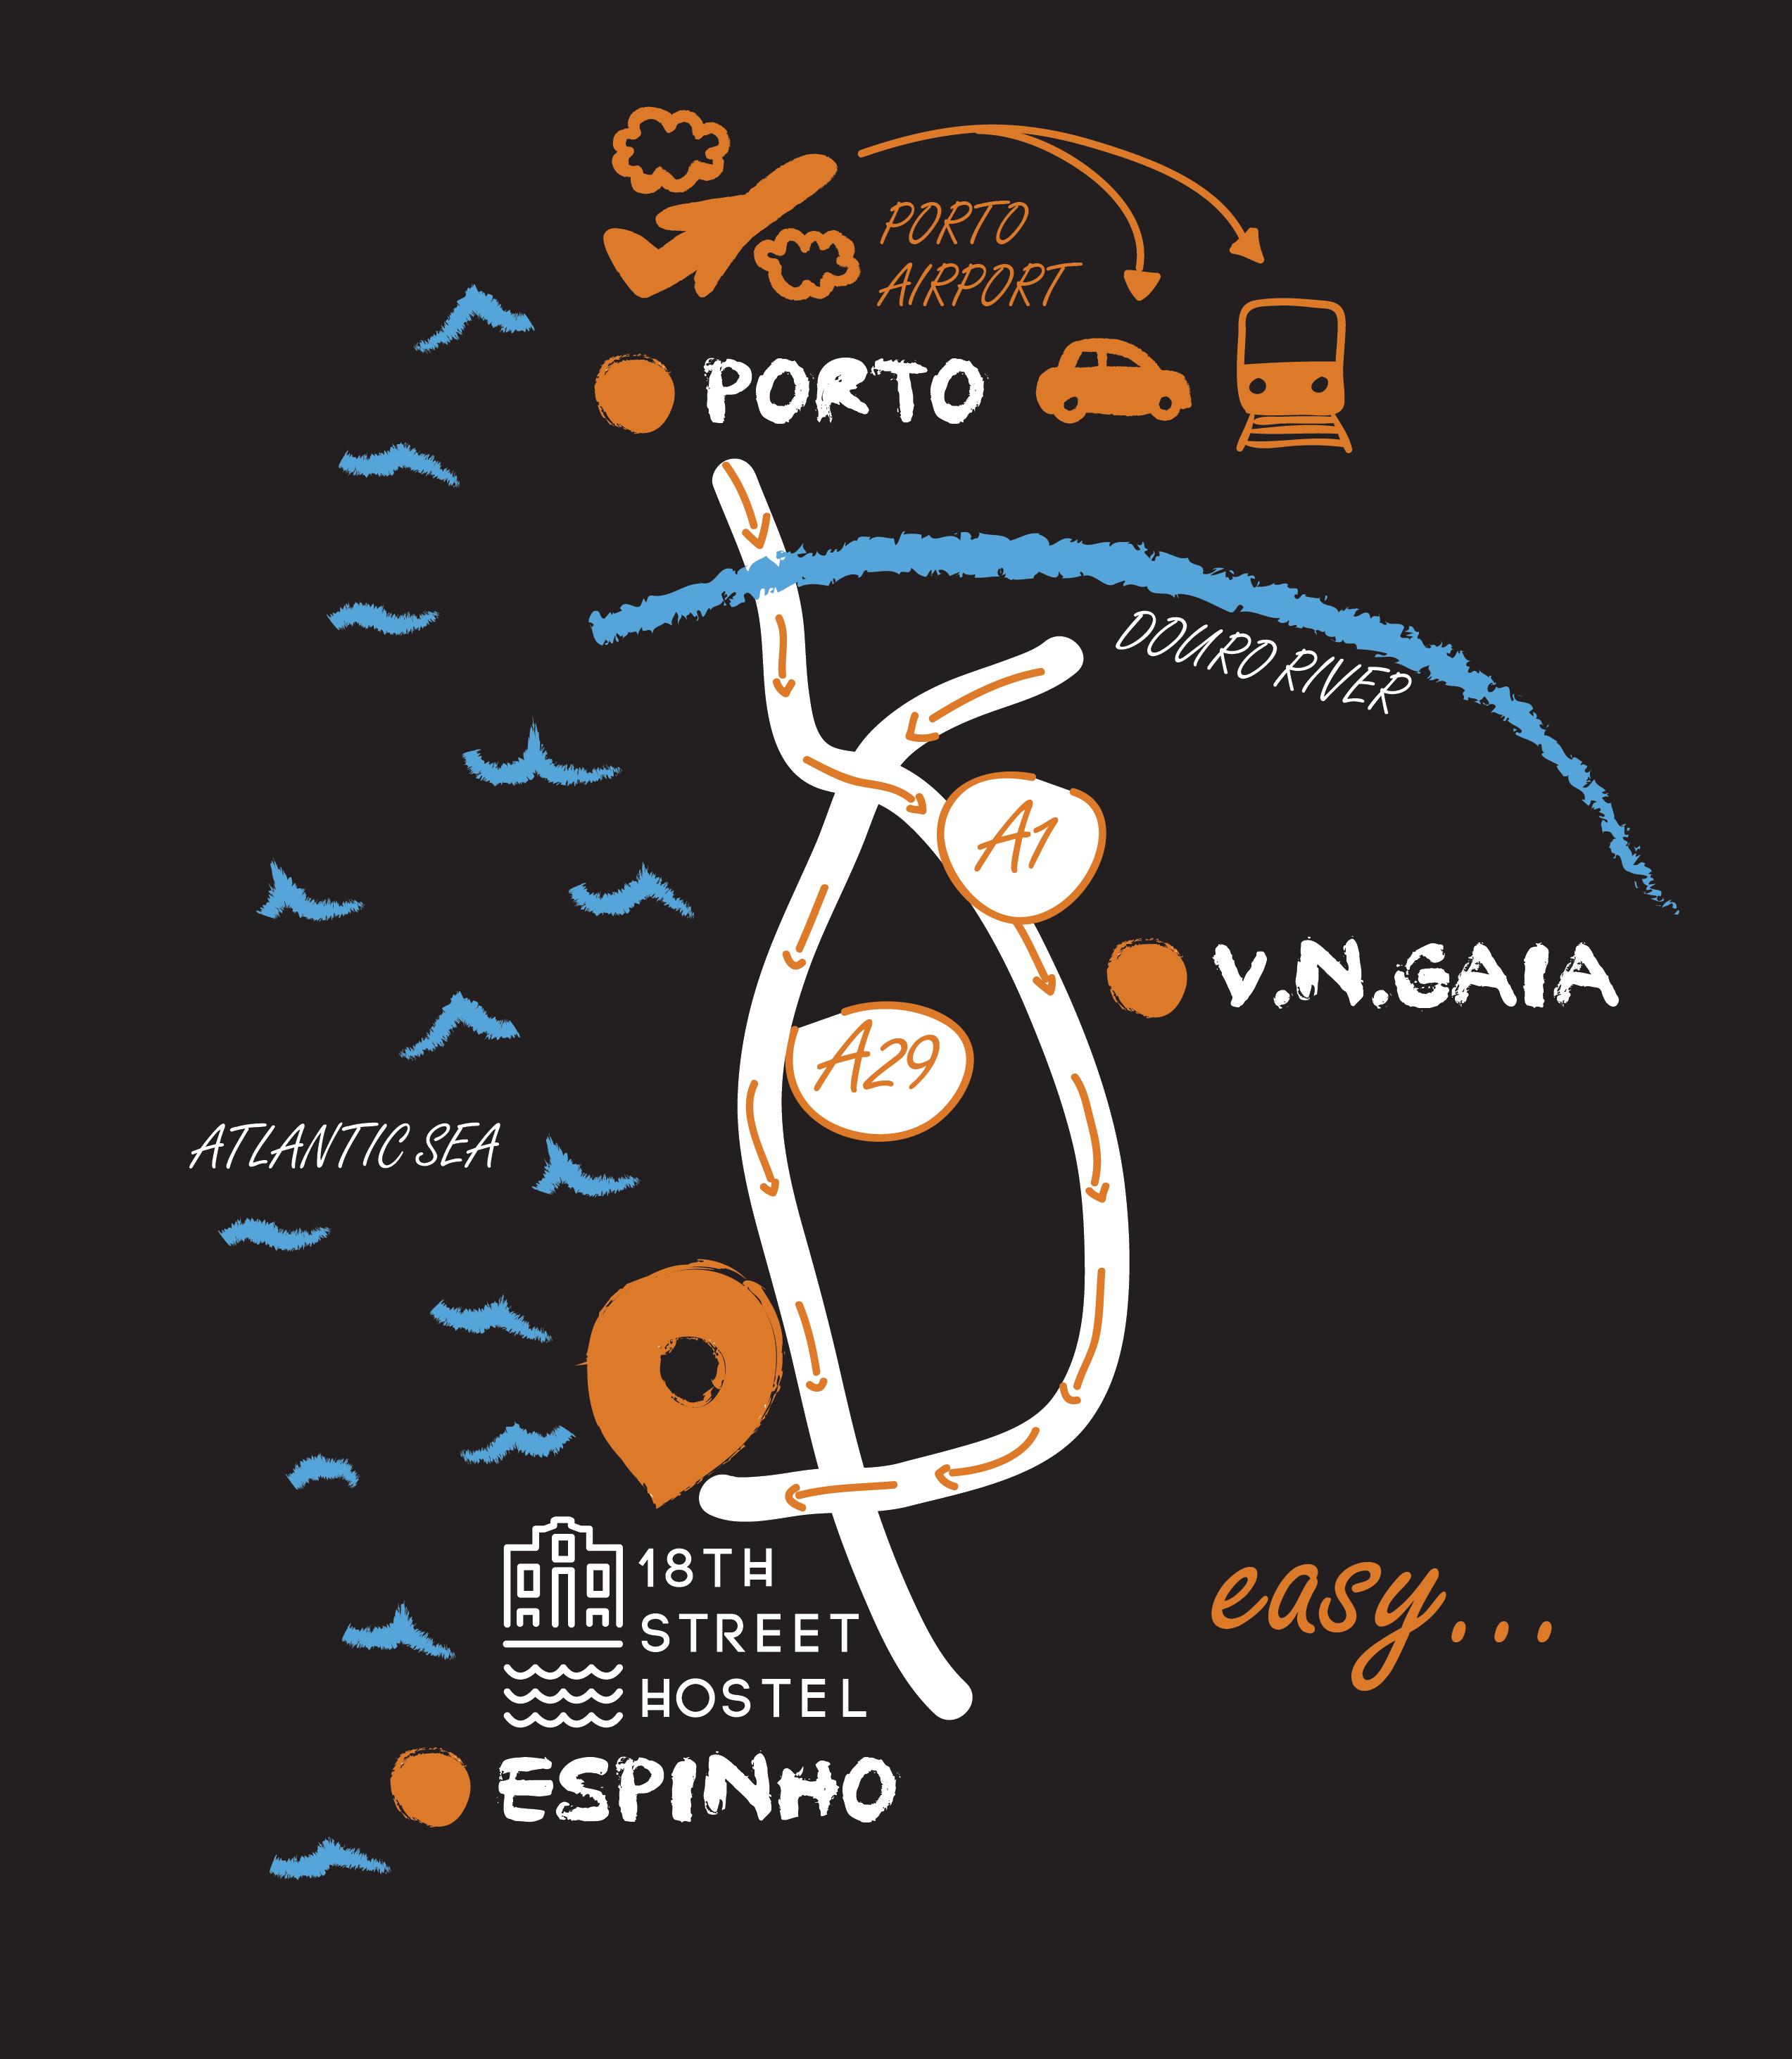 Mapa 18 St. Hostel